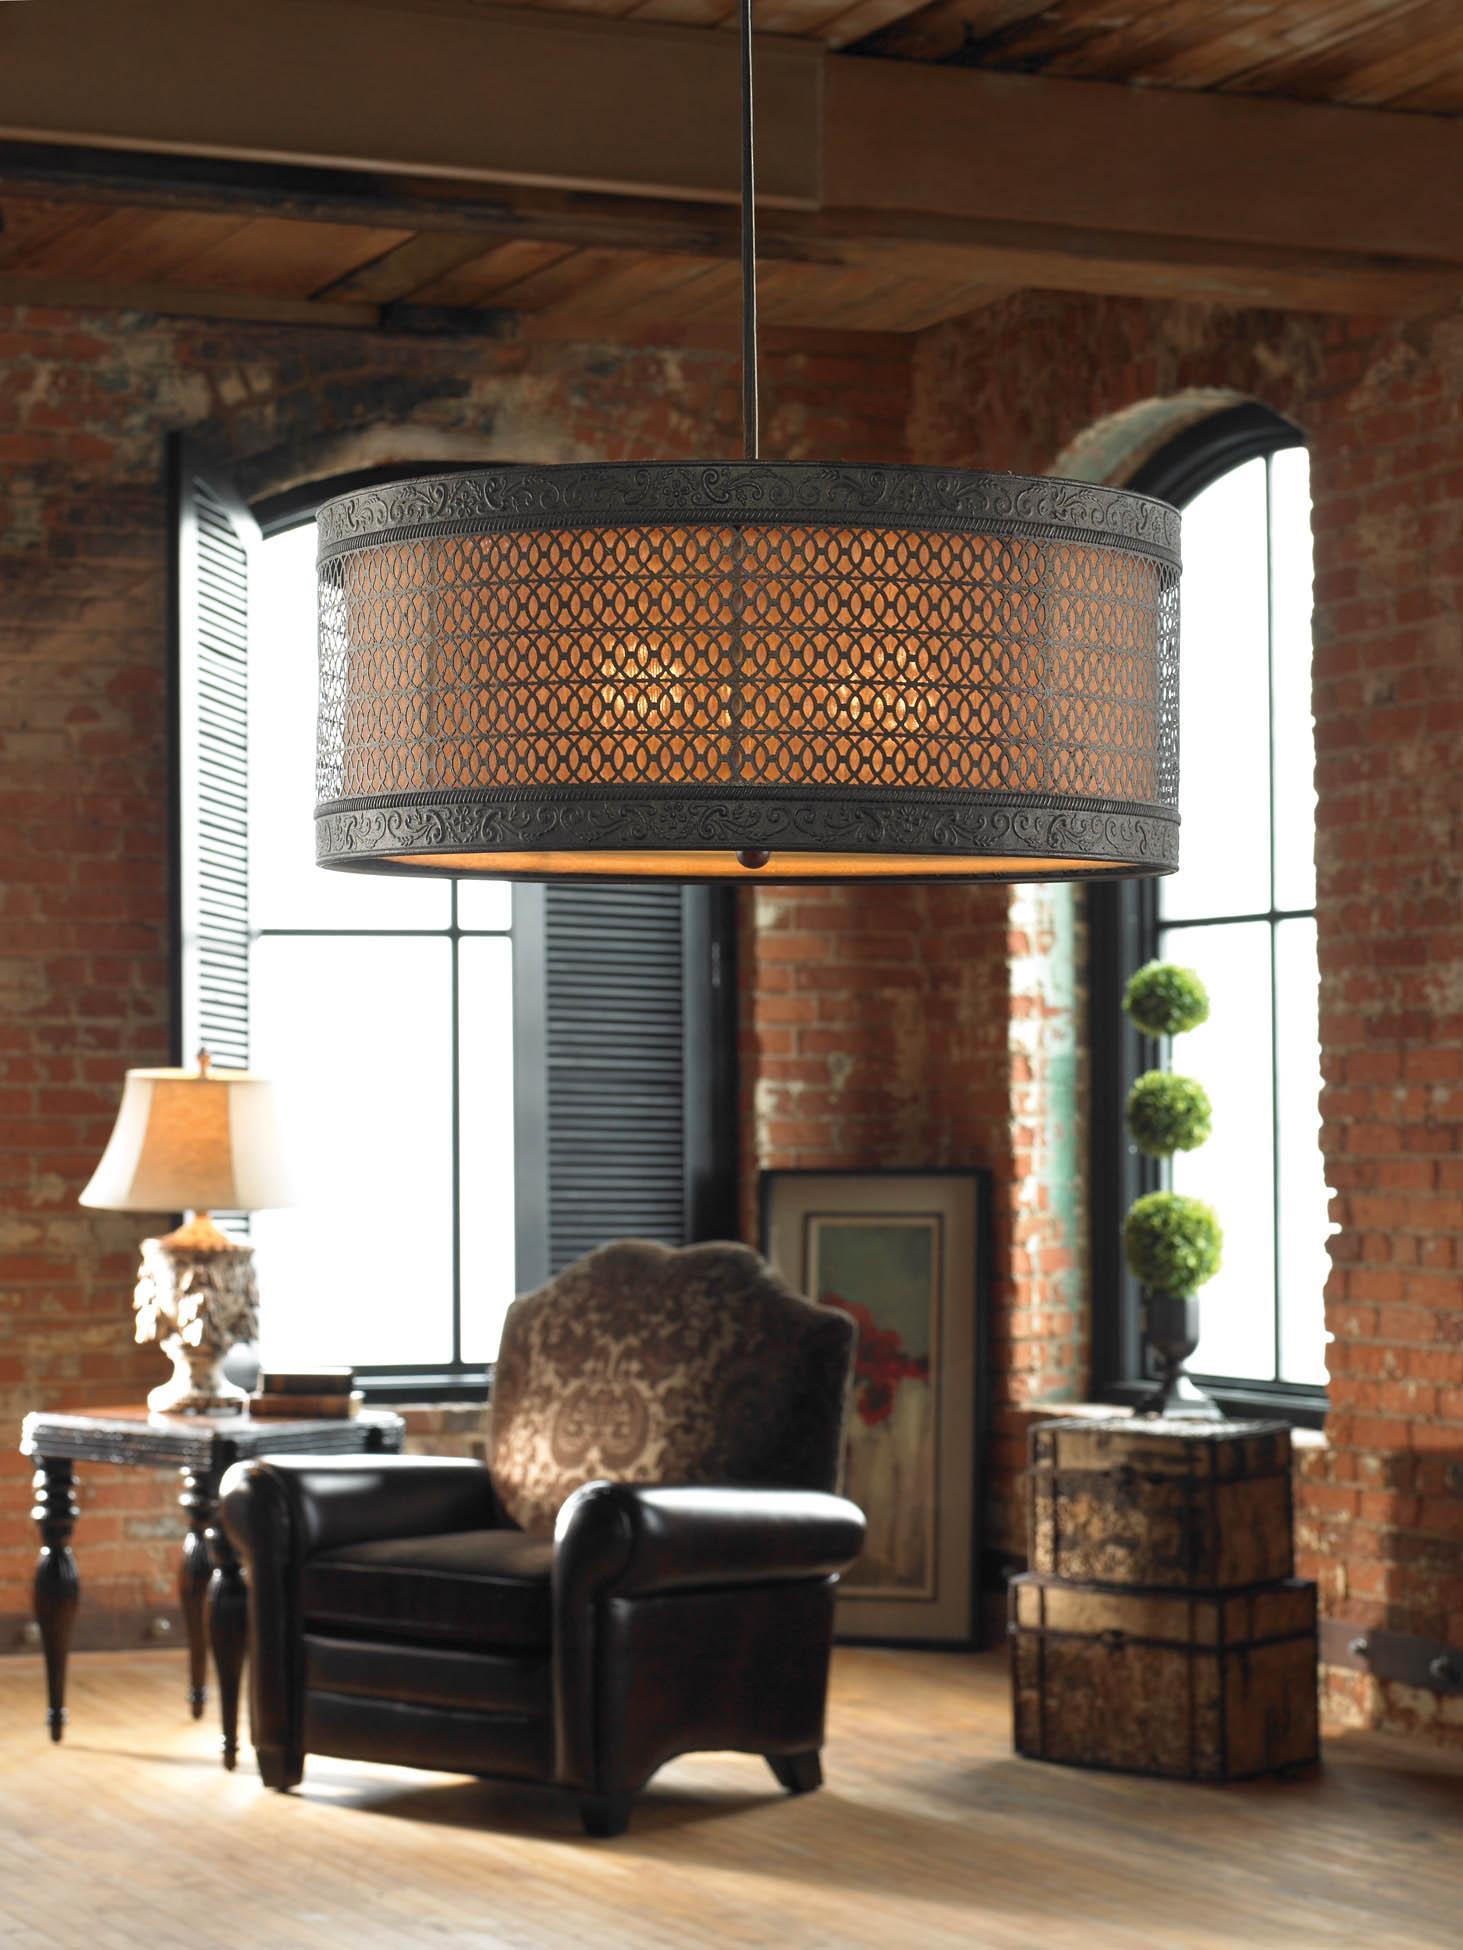 Uttermost Lighting Fixtures New Orleans 3 Light Hanging Shade - Item Number: 21891